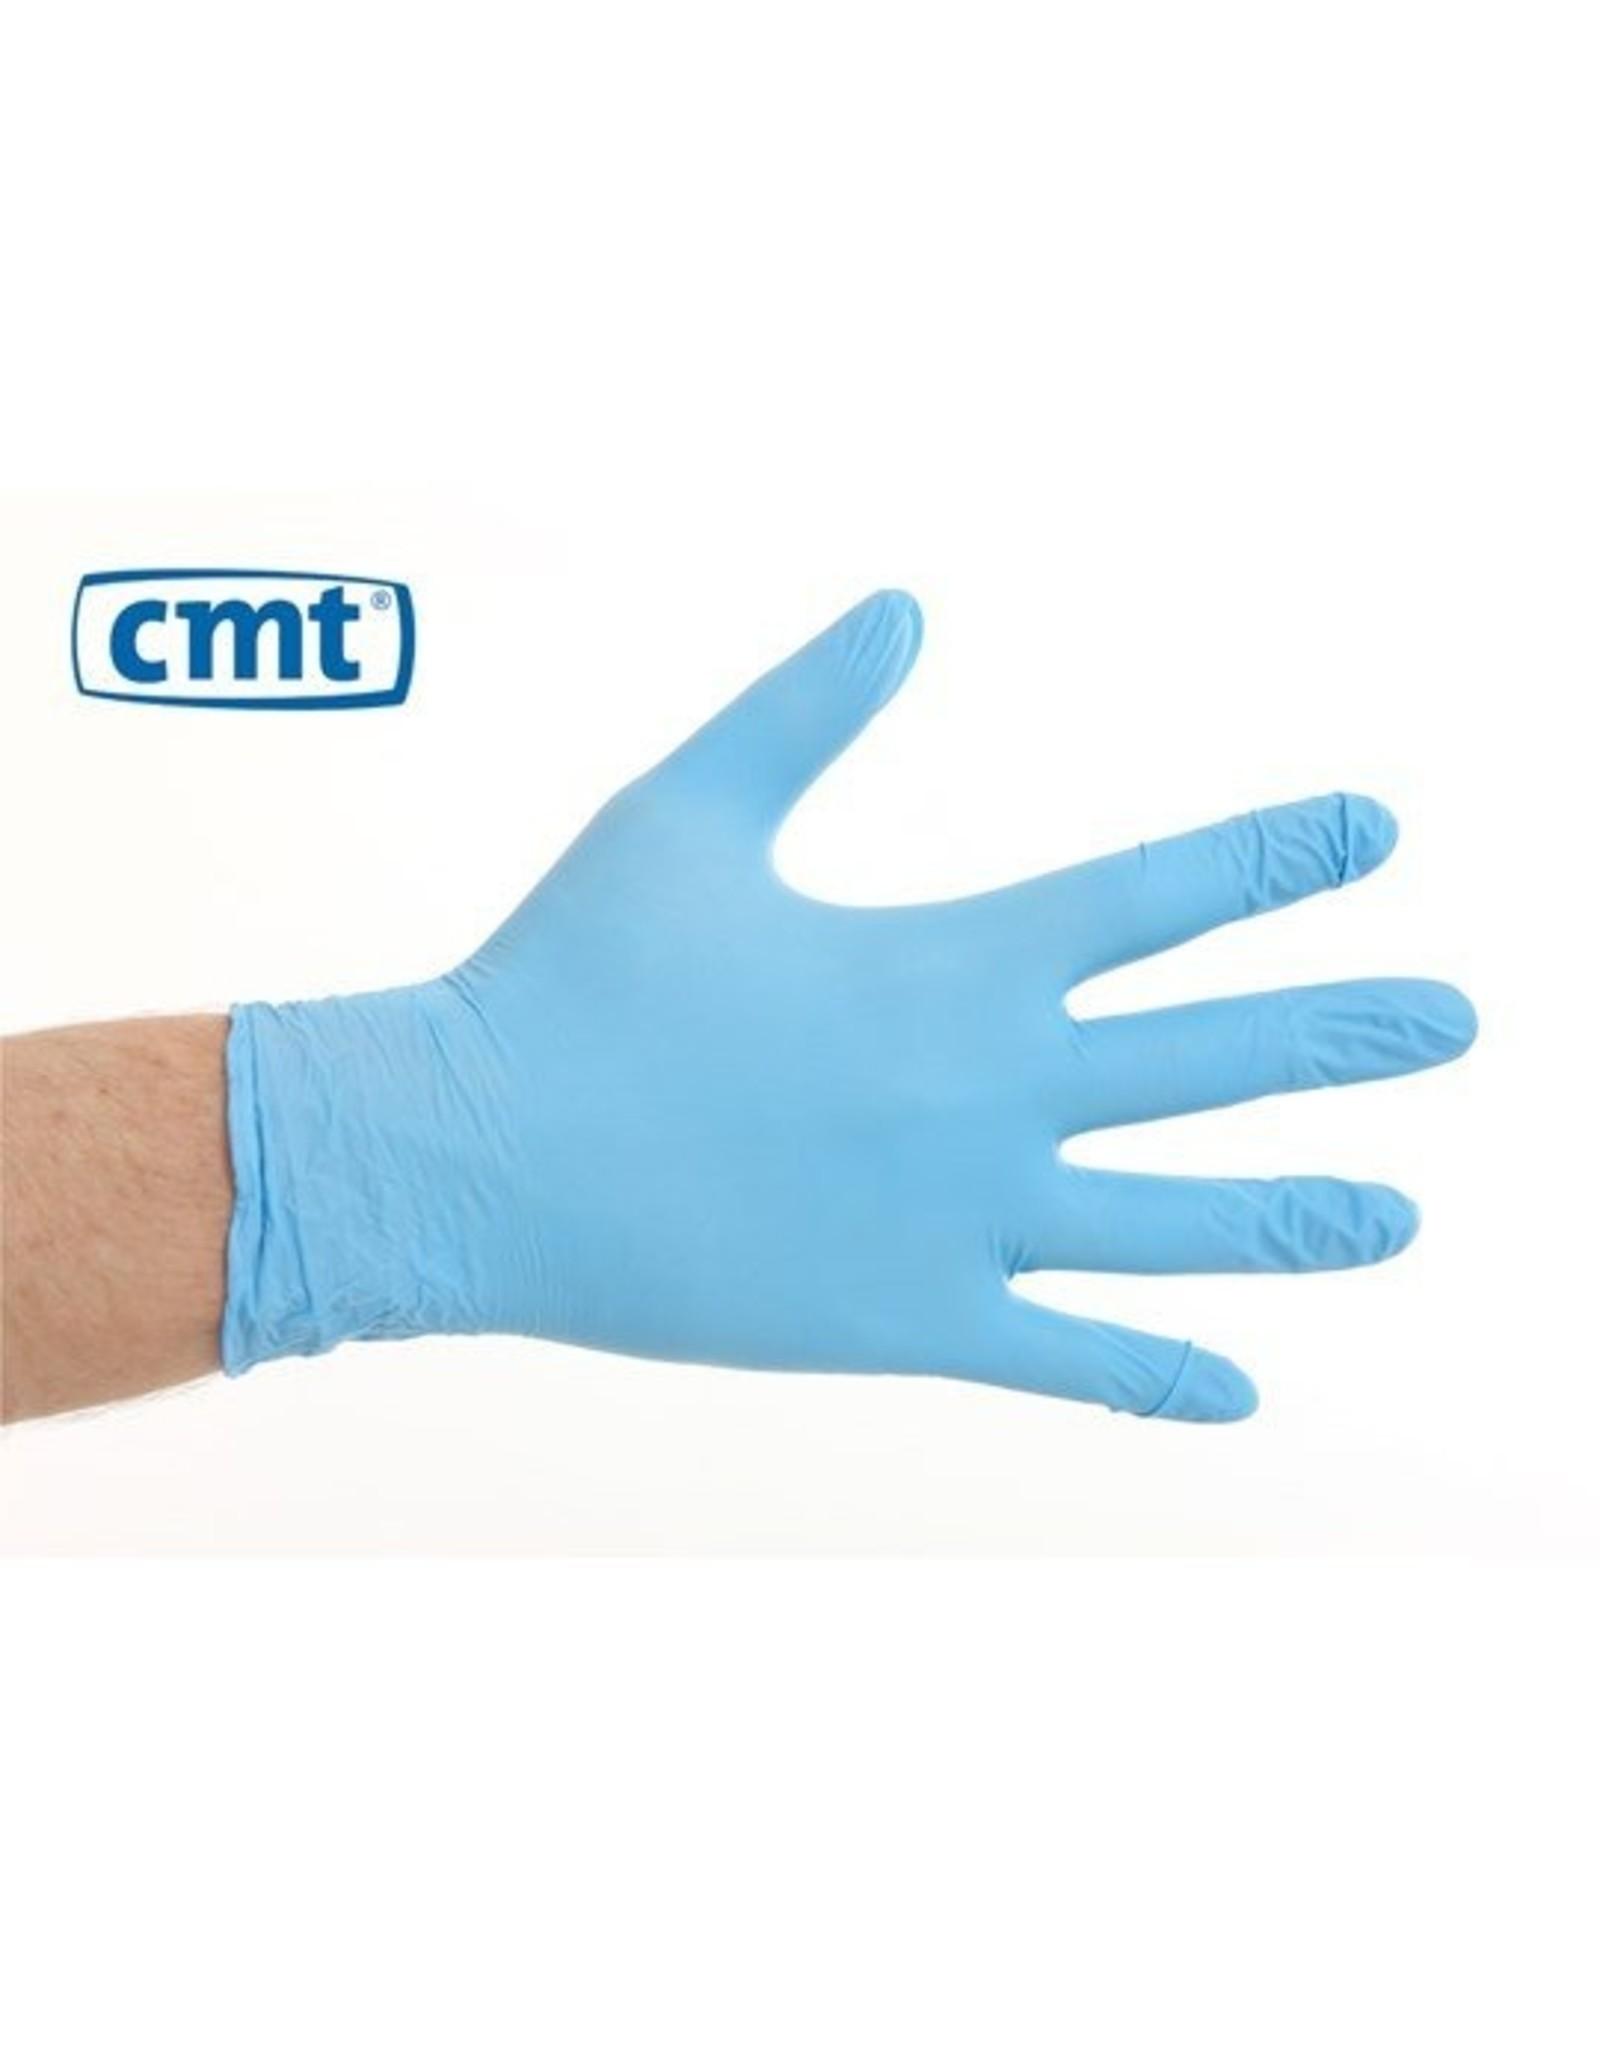 CMT CMT soft nitril handschoenen poedervrij  L blauw